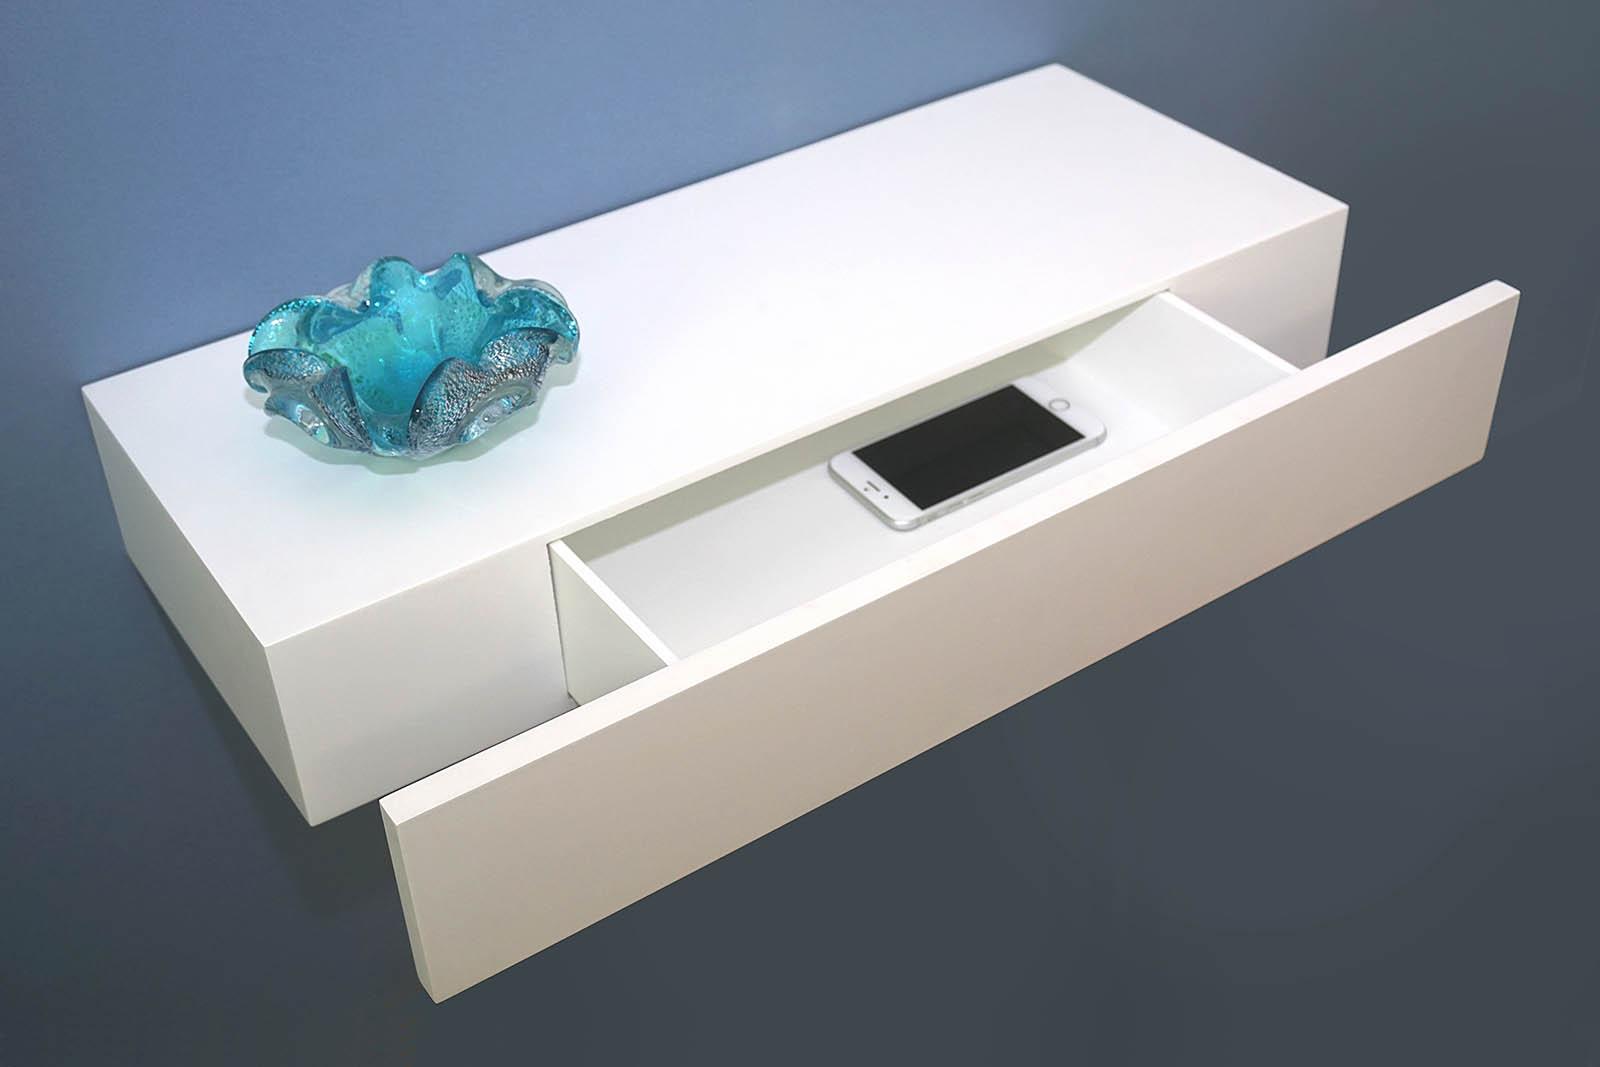 White Floating Shelf Floating Shelf With Drawer 600x250x100mm The Shelving Shop